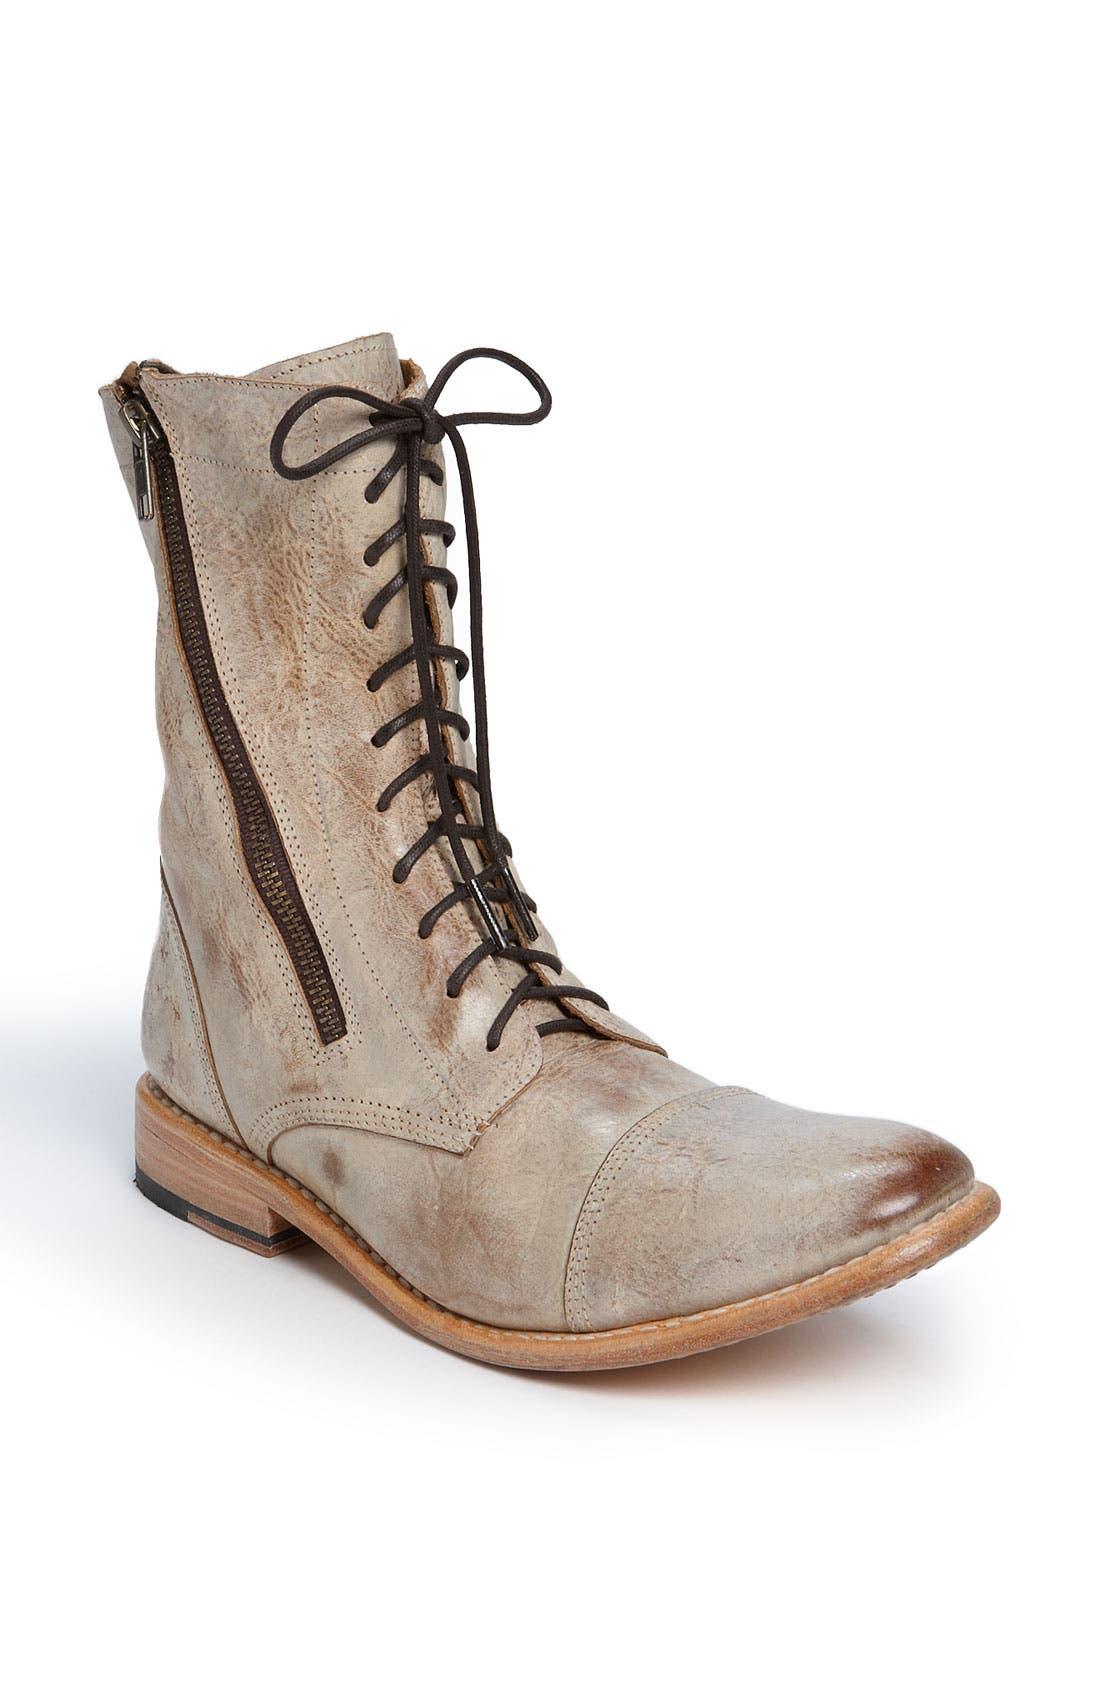 Main Image - Bed Stu 'Tabor' Boot